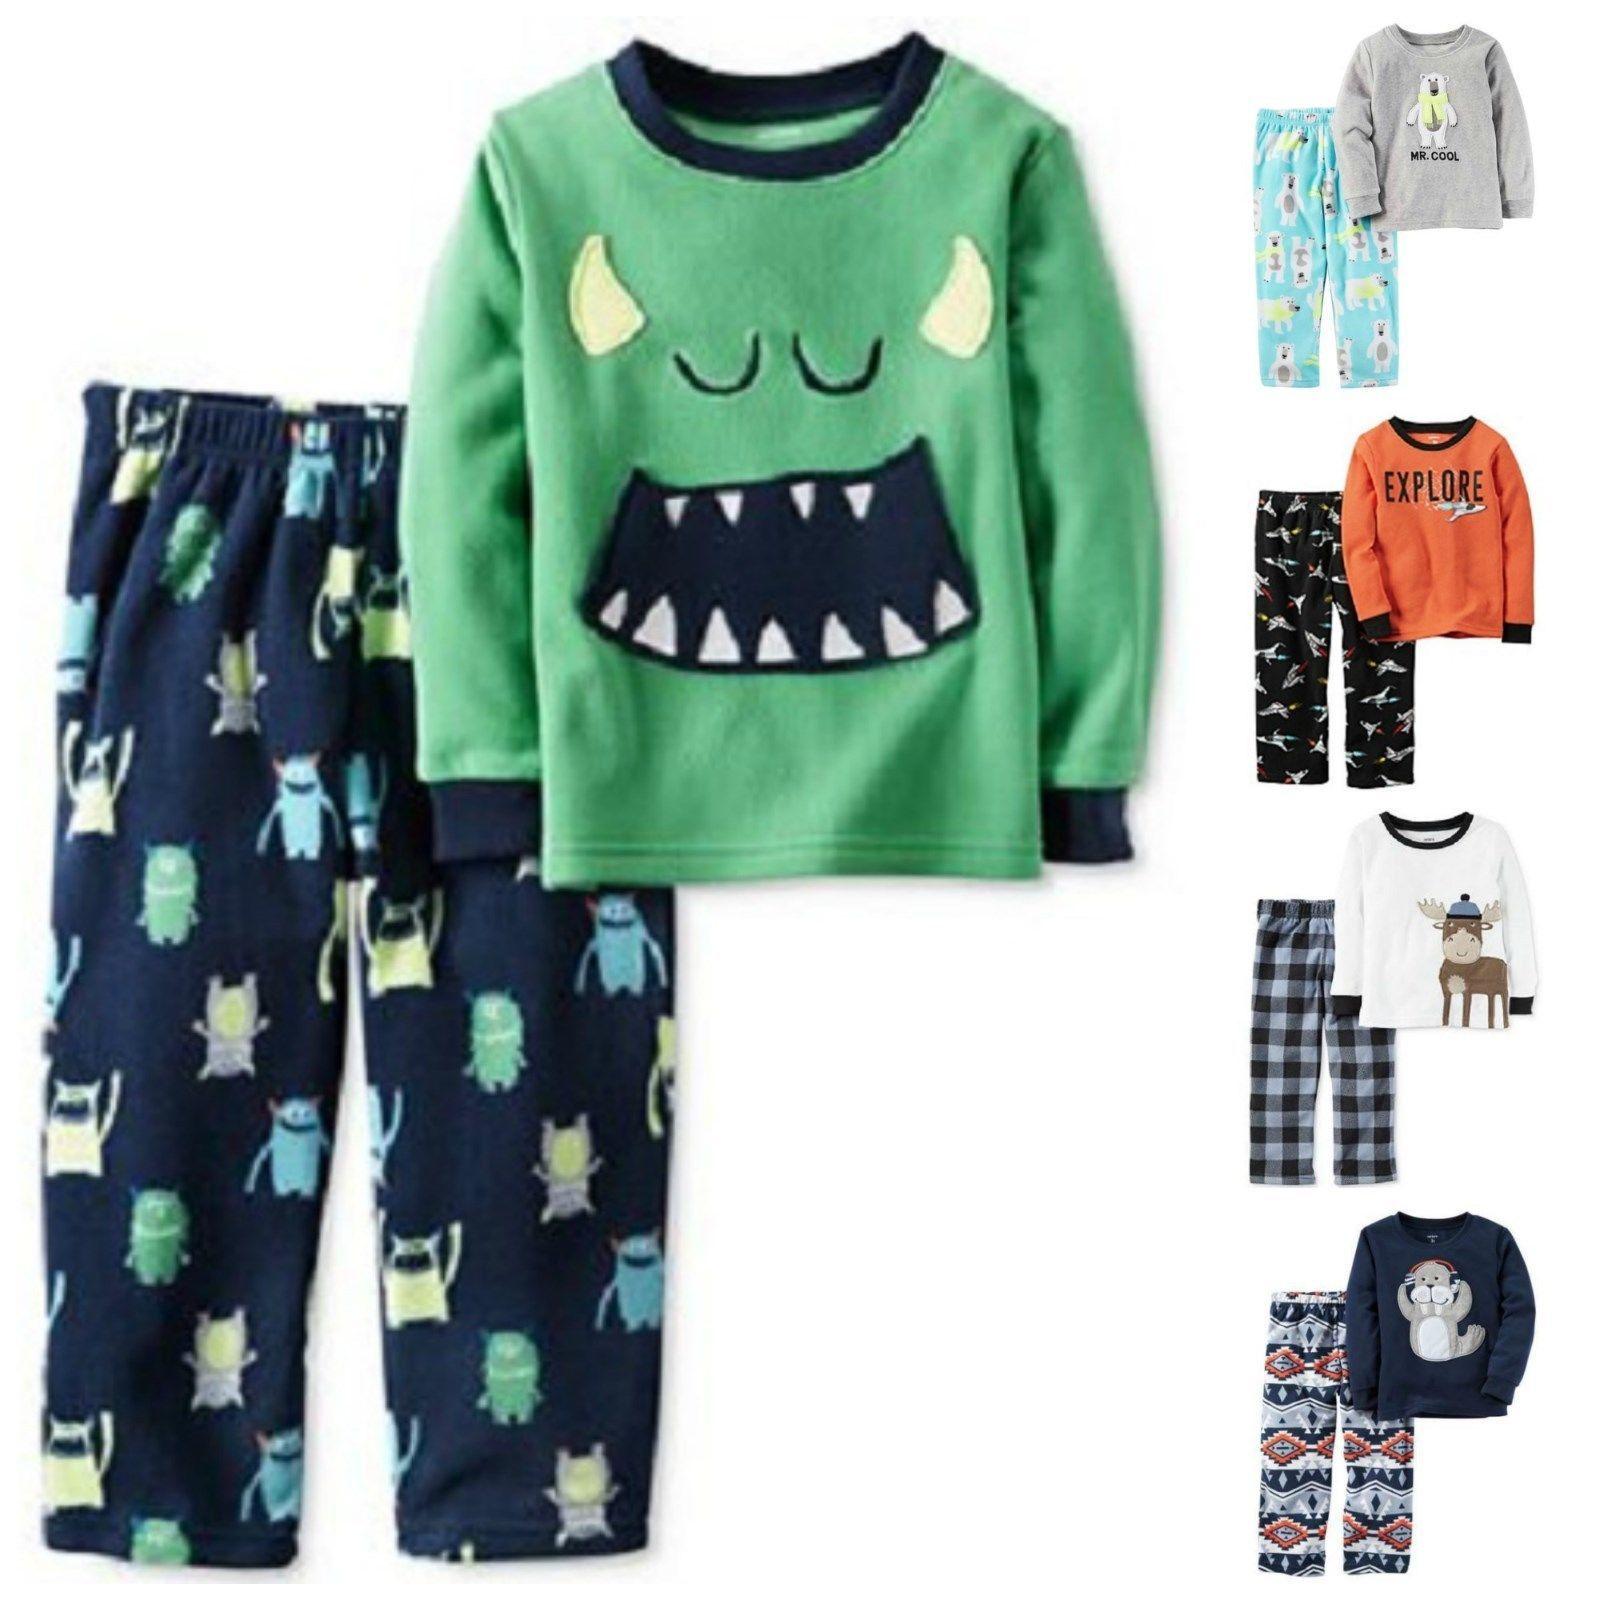 3302f8e25 NWT Infant Boys CARTER S 2-Pc Pajamas Sets and 19 similar items